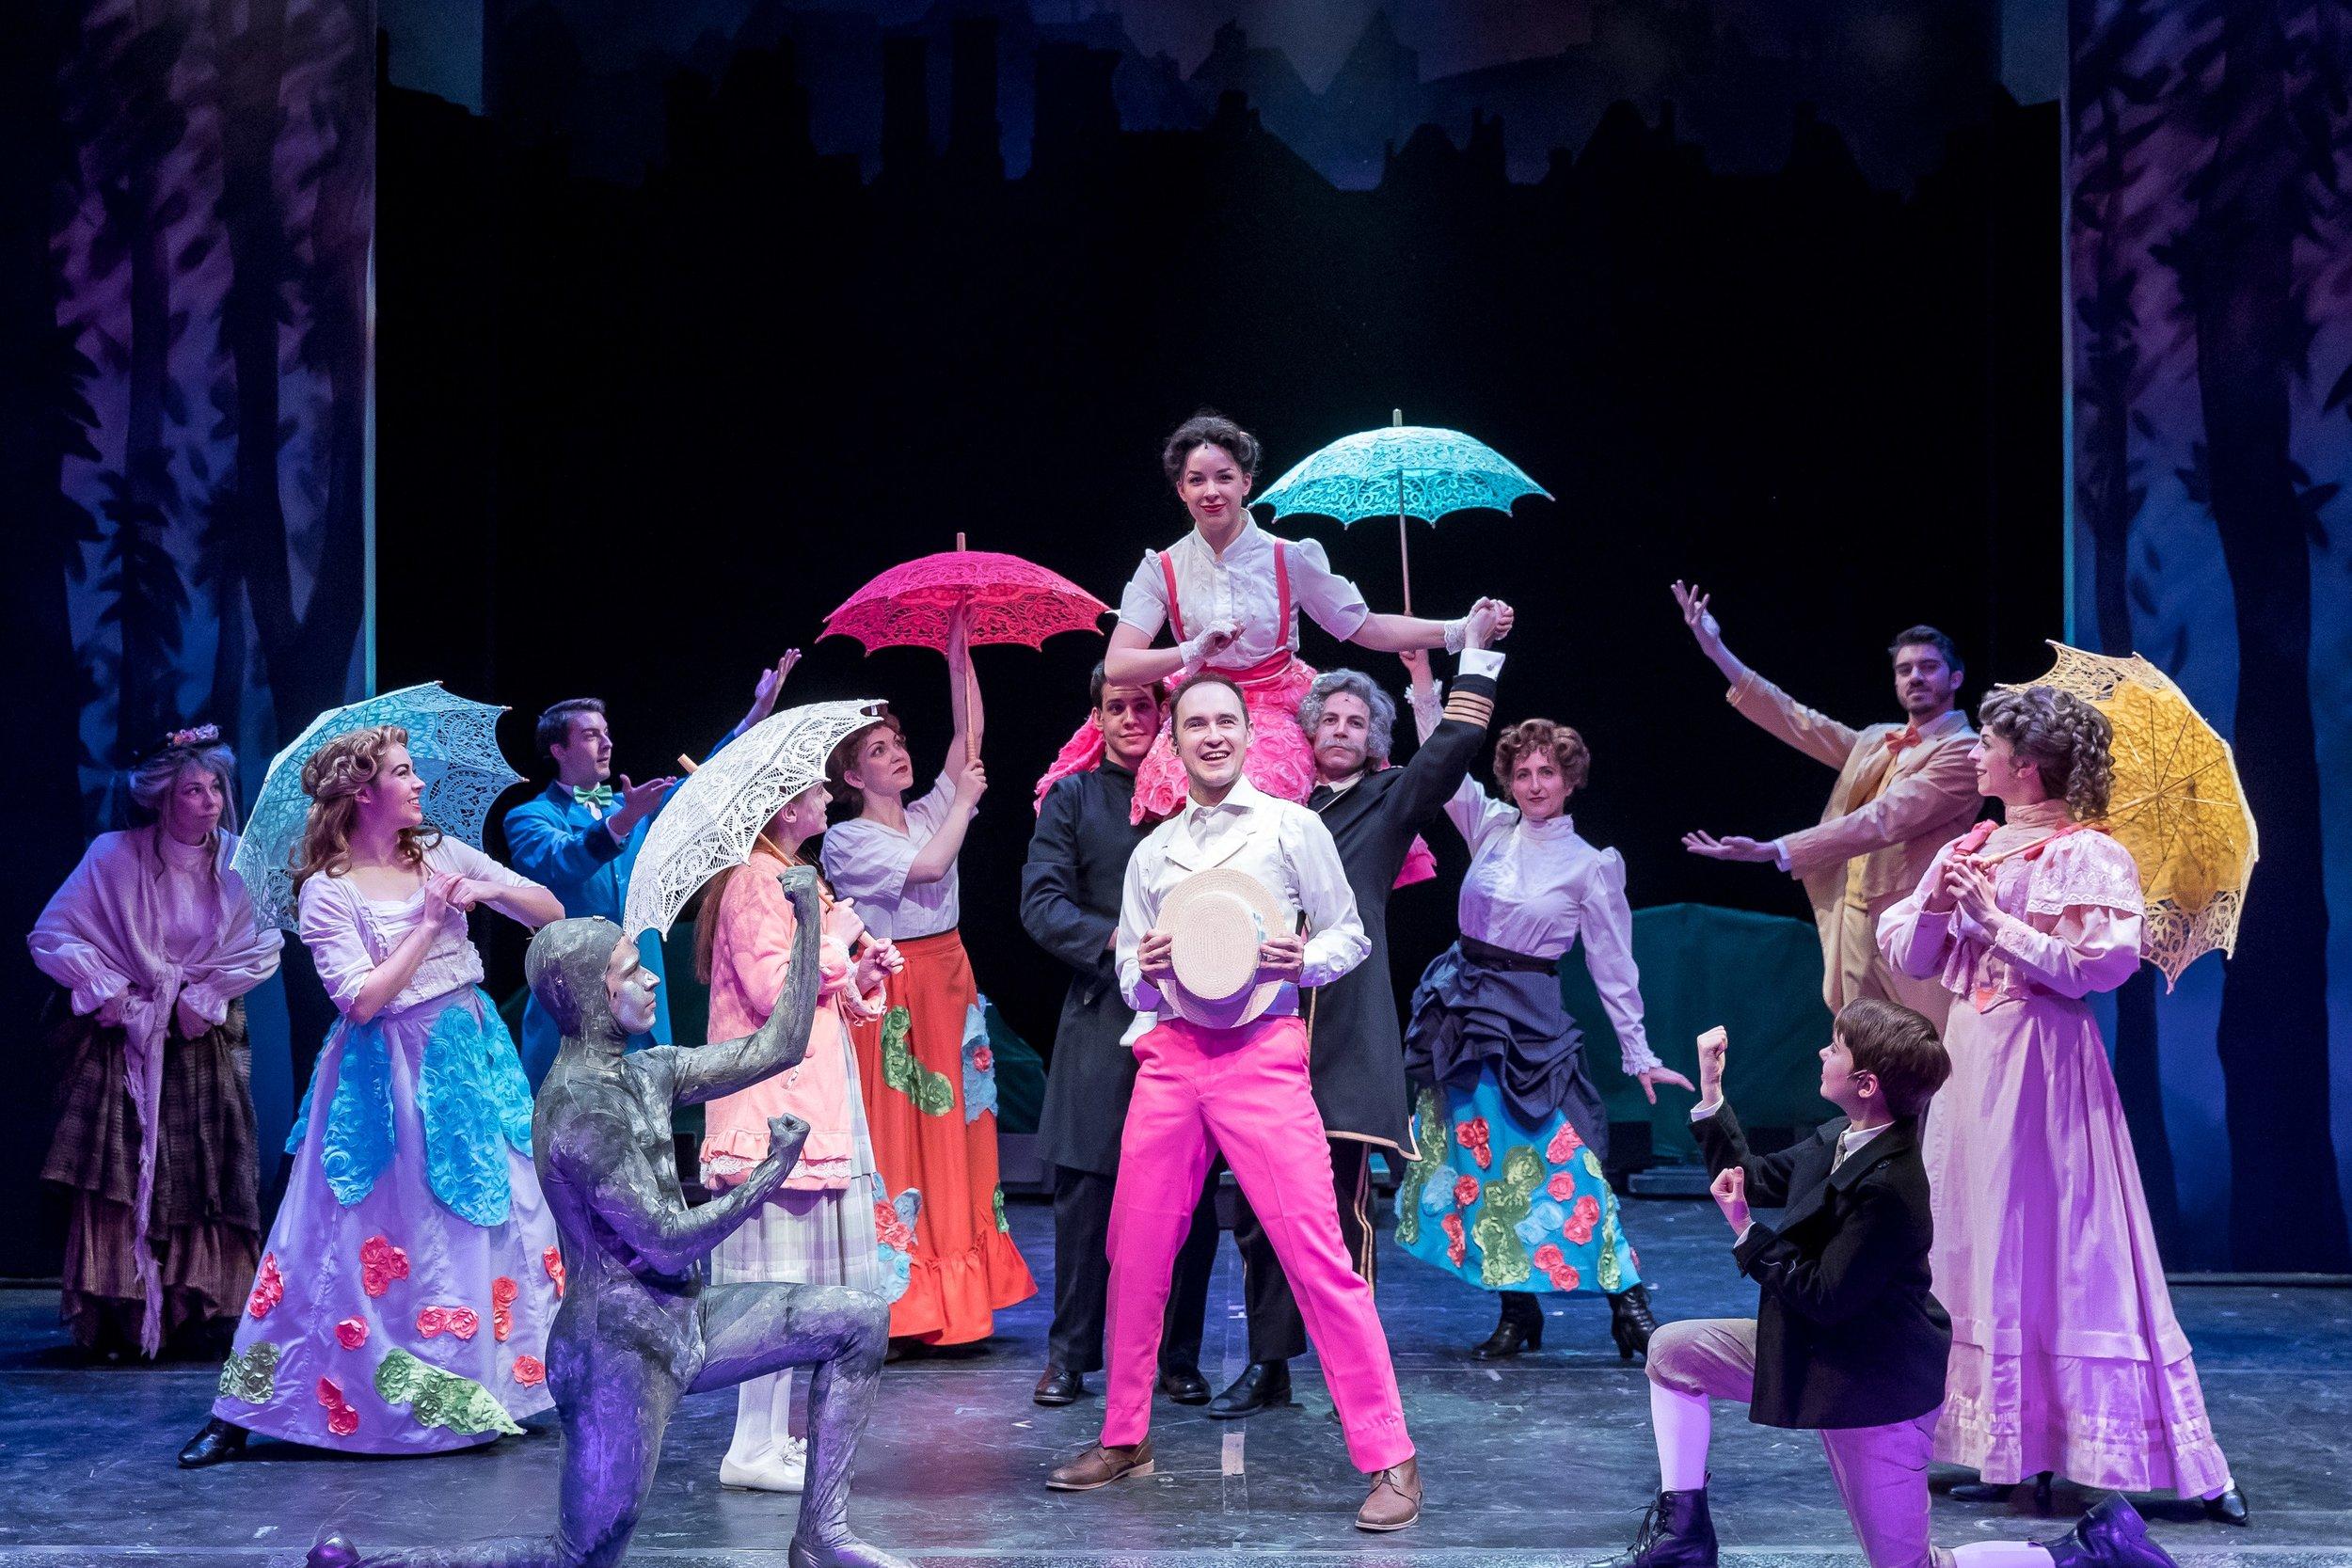 Mercury-Theater-Mary-Poppins-Full-Ensemble-Brett-A.-Beiner.jpg